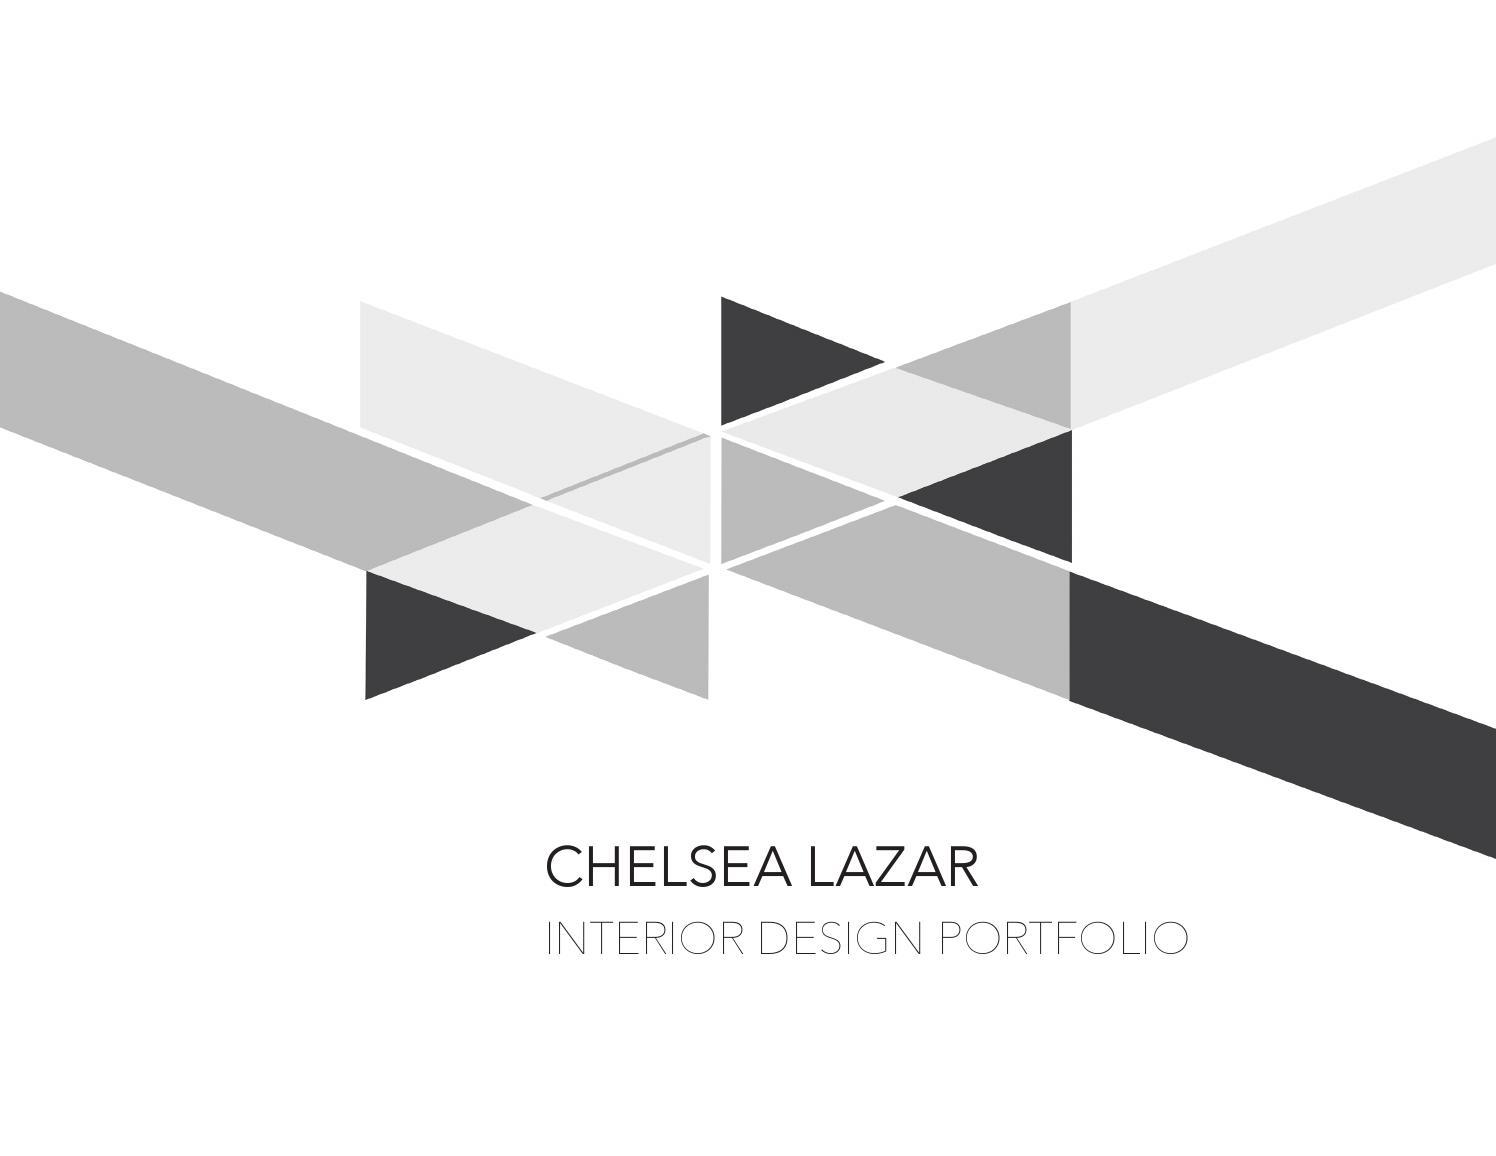 Interior Design Portfolio By Chelsea Lazar Issuu